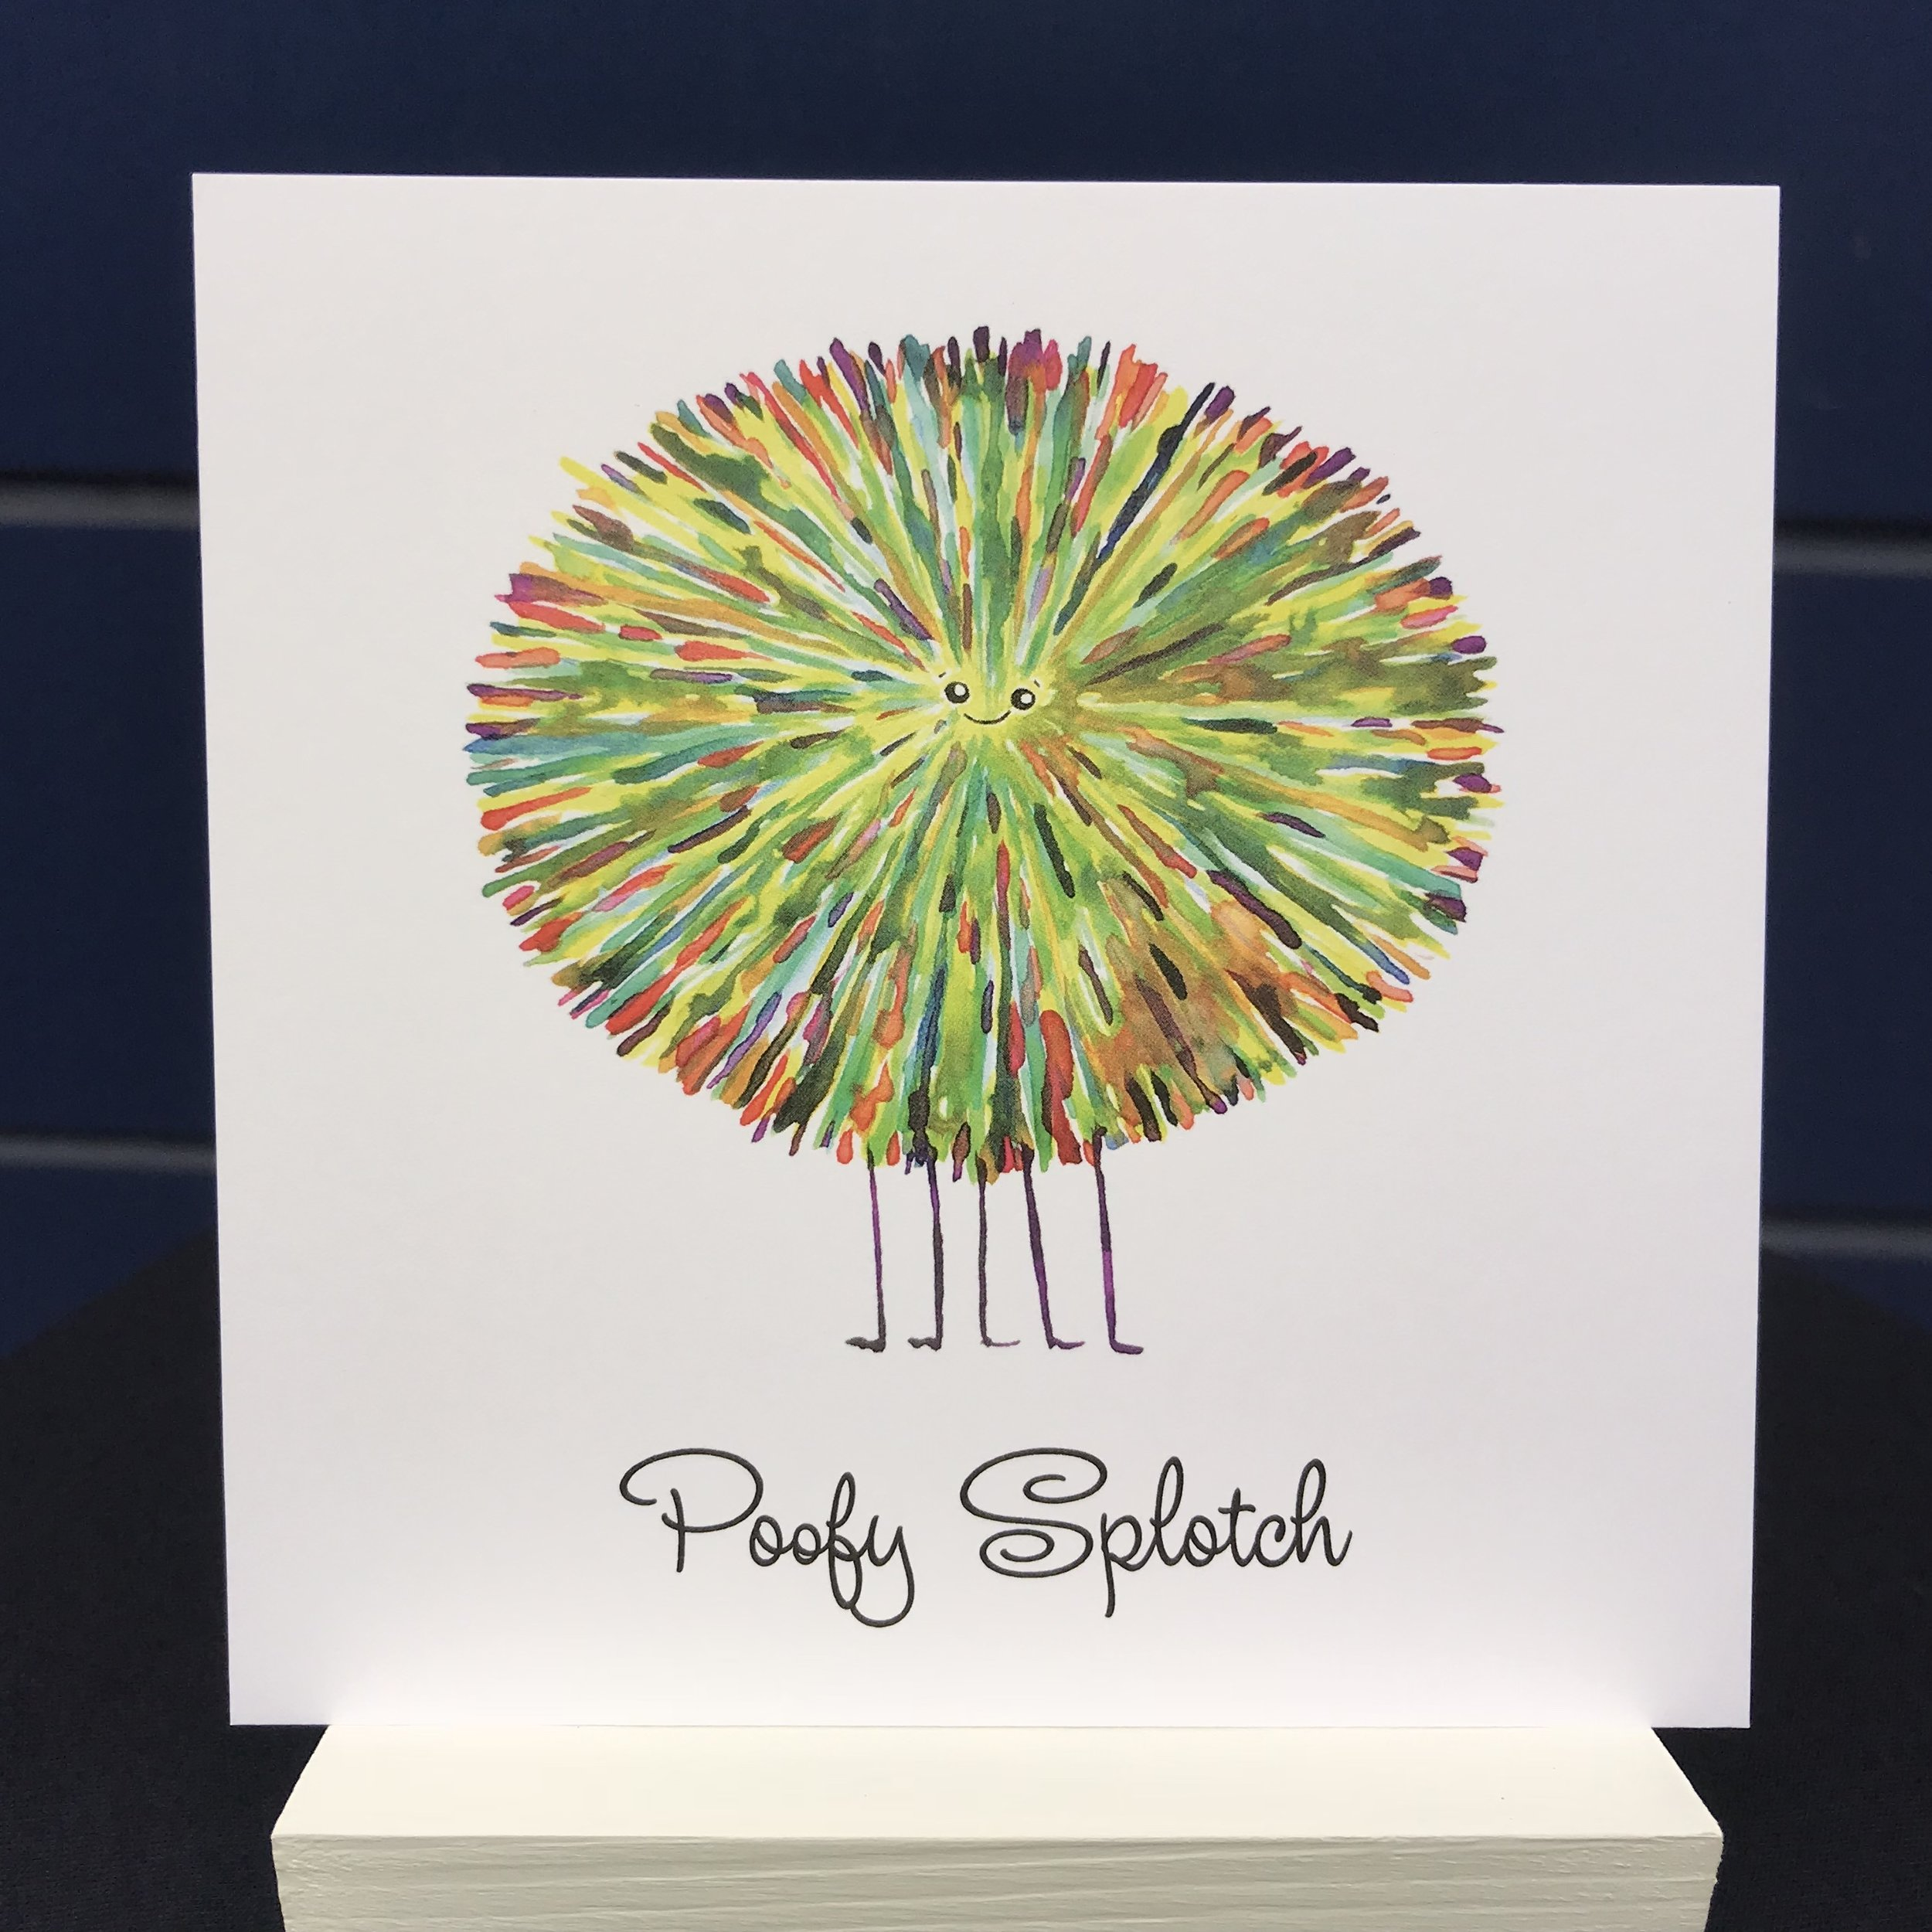 Poofy-Splotch-Print.jpeg